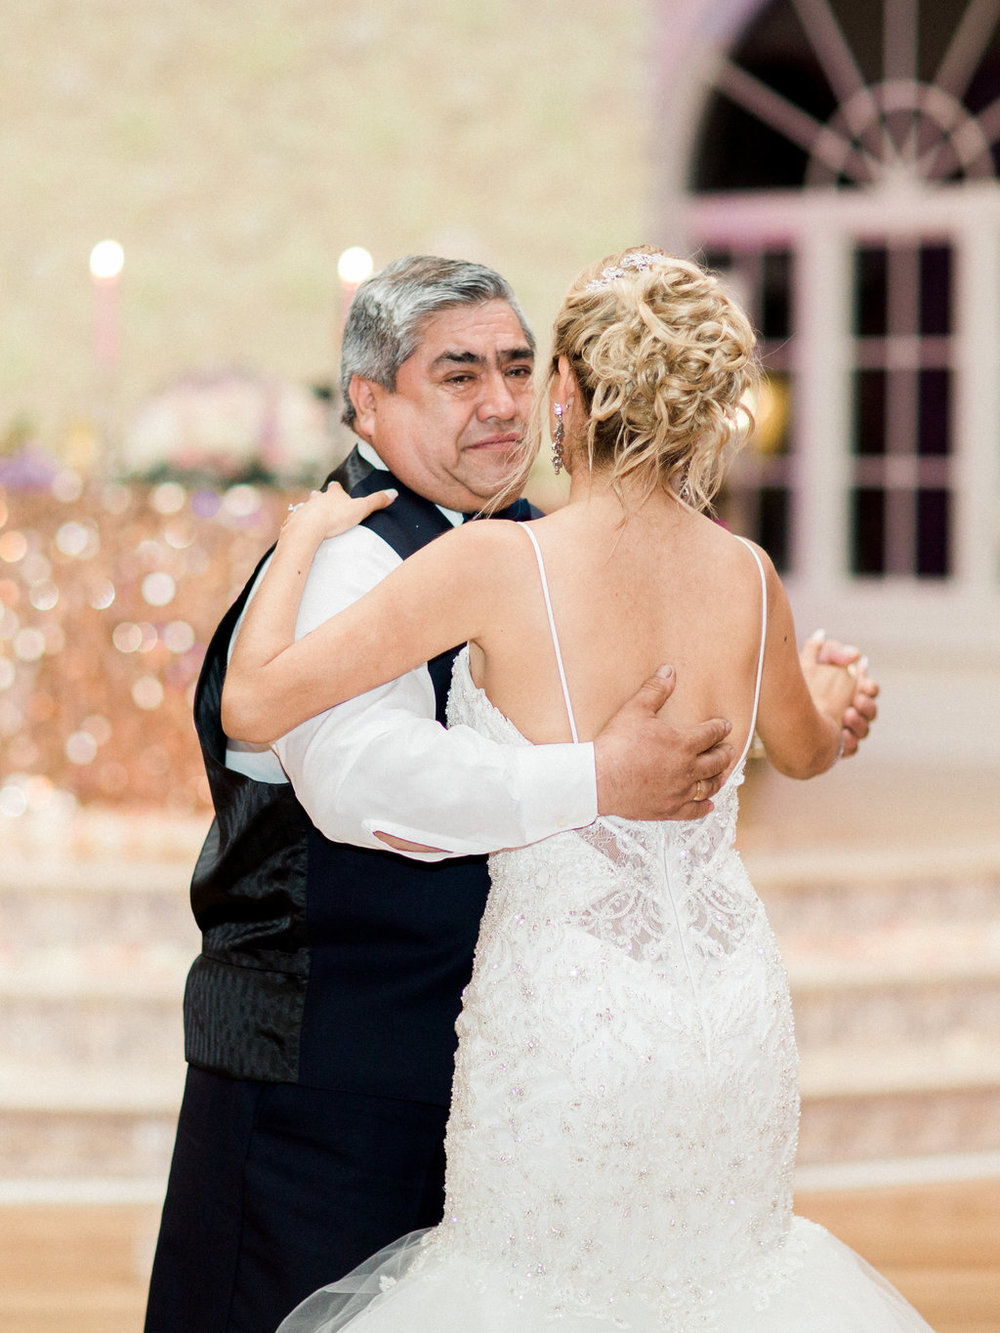 Morais-Vineyards-Winery-Beatleton-Virginia-Wedding-Photographer-79.jpg